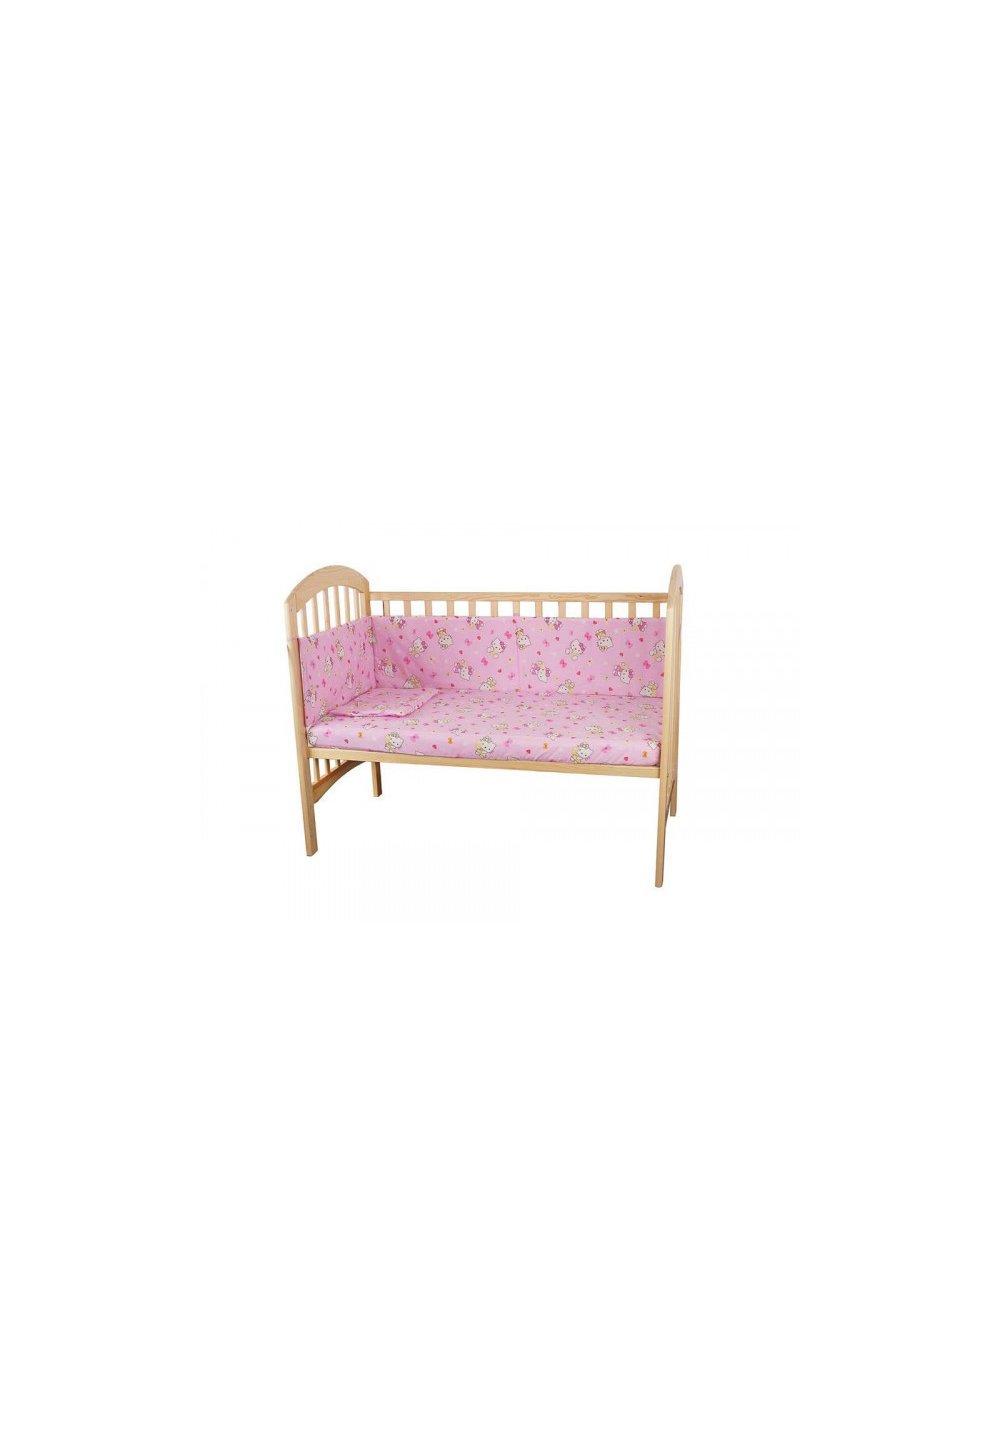 Lenjerie patut Hello Kitty, 5 piese, roz deschis, 140x70 cm imagine